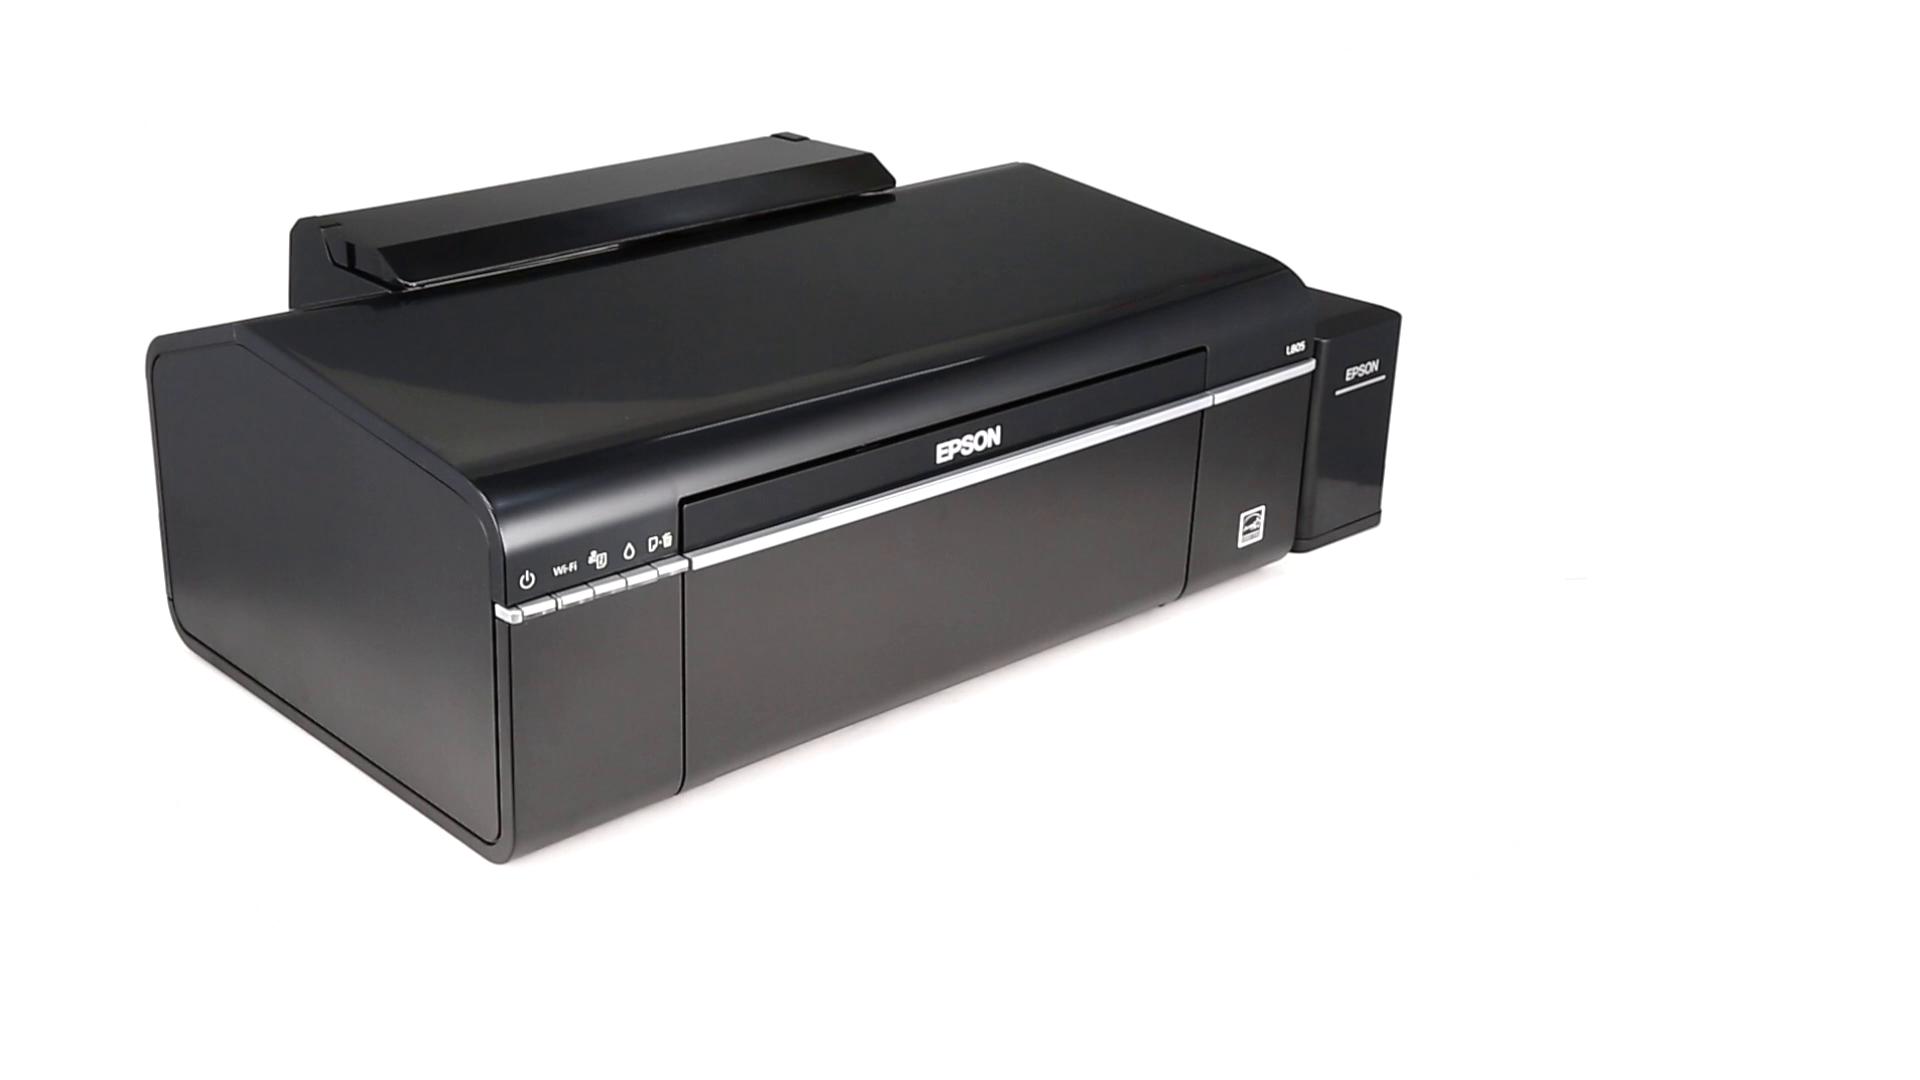 Epson L805 Single-Function Wireless Ink Tank Colour Photo Printer